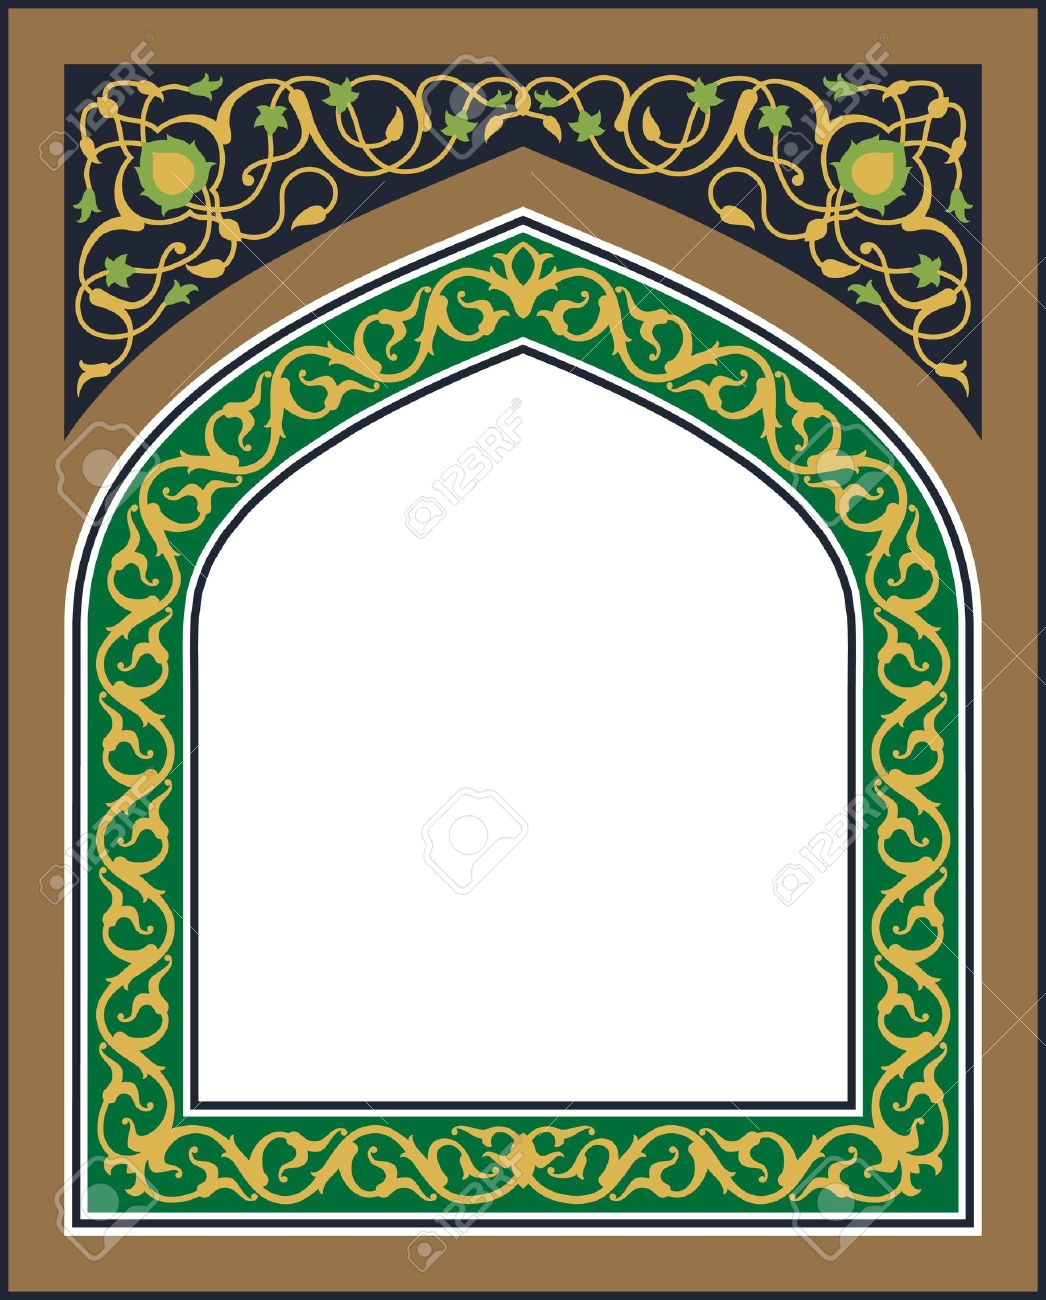 Islamic arch clipart.